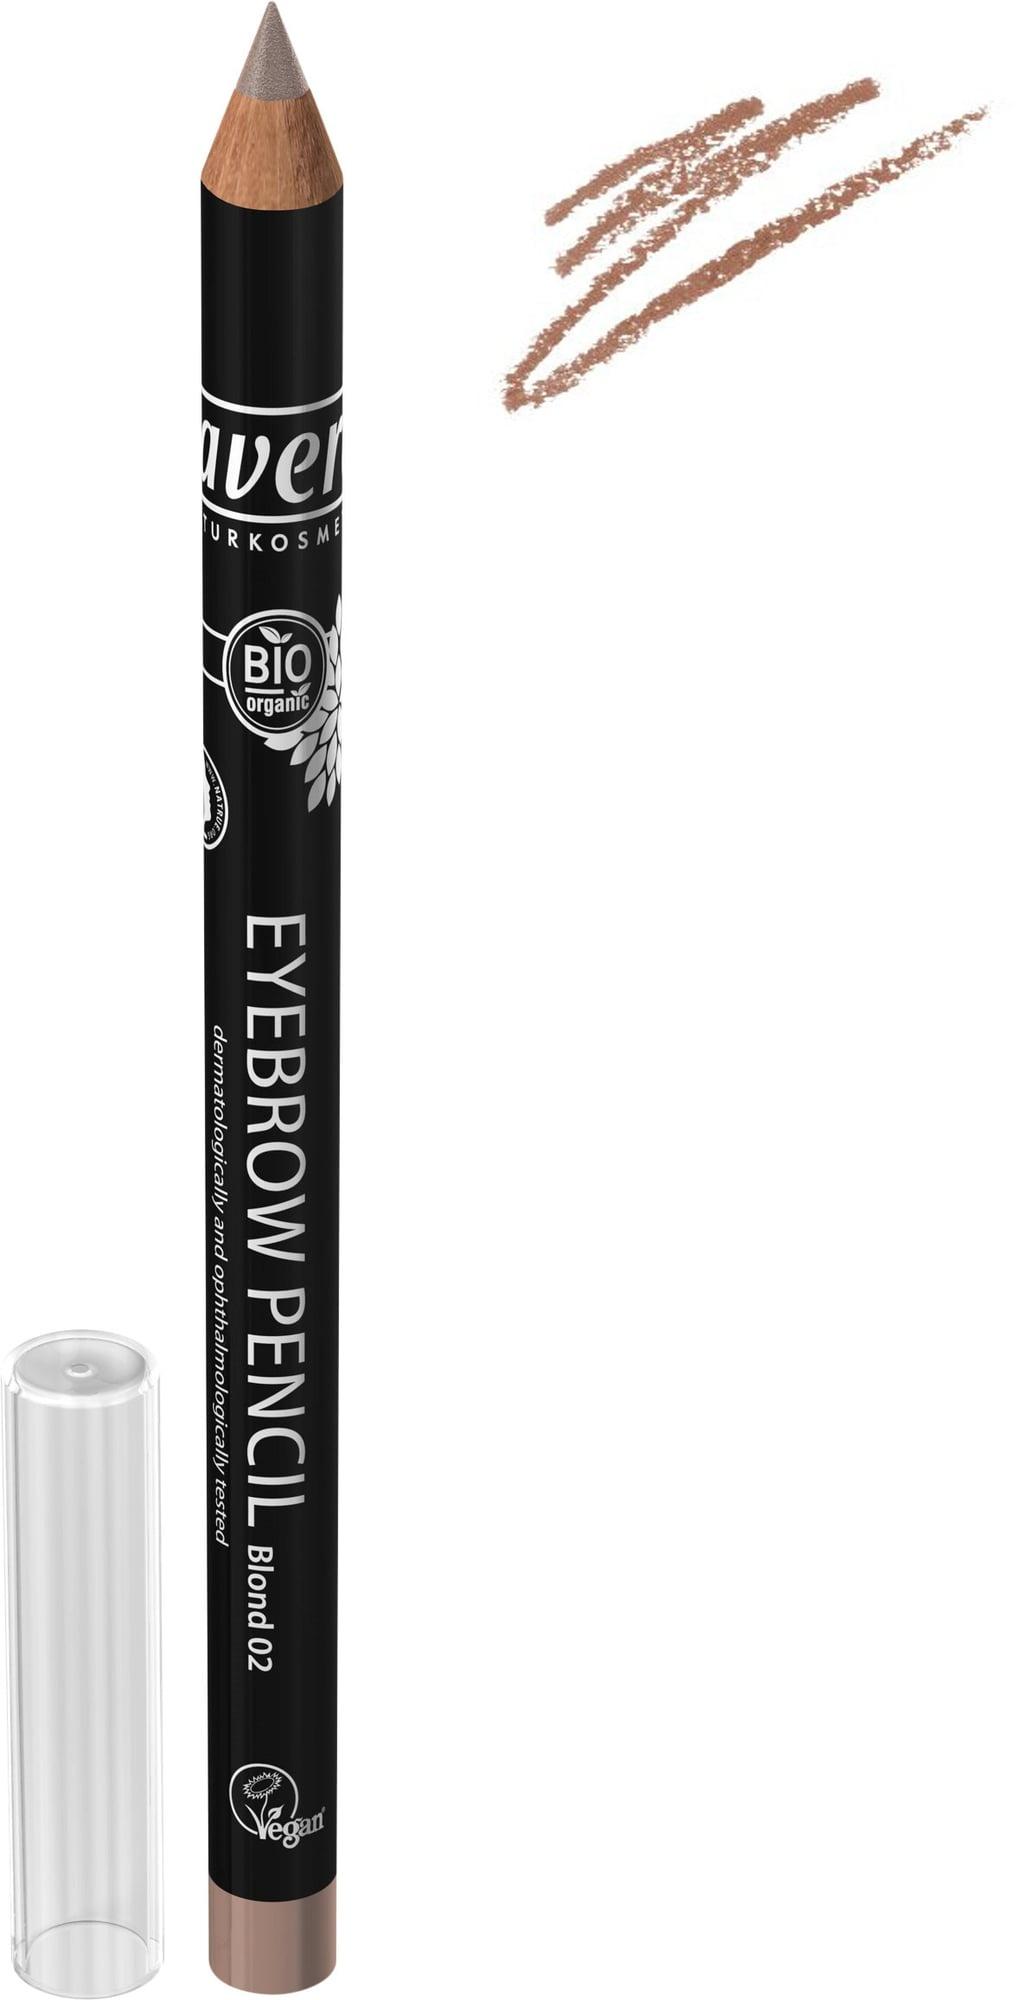 Lavera Trend Eyebrow Pencil Blonde 02, 1.14g